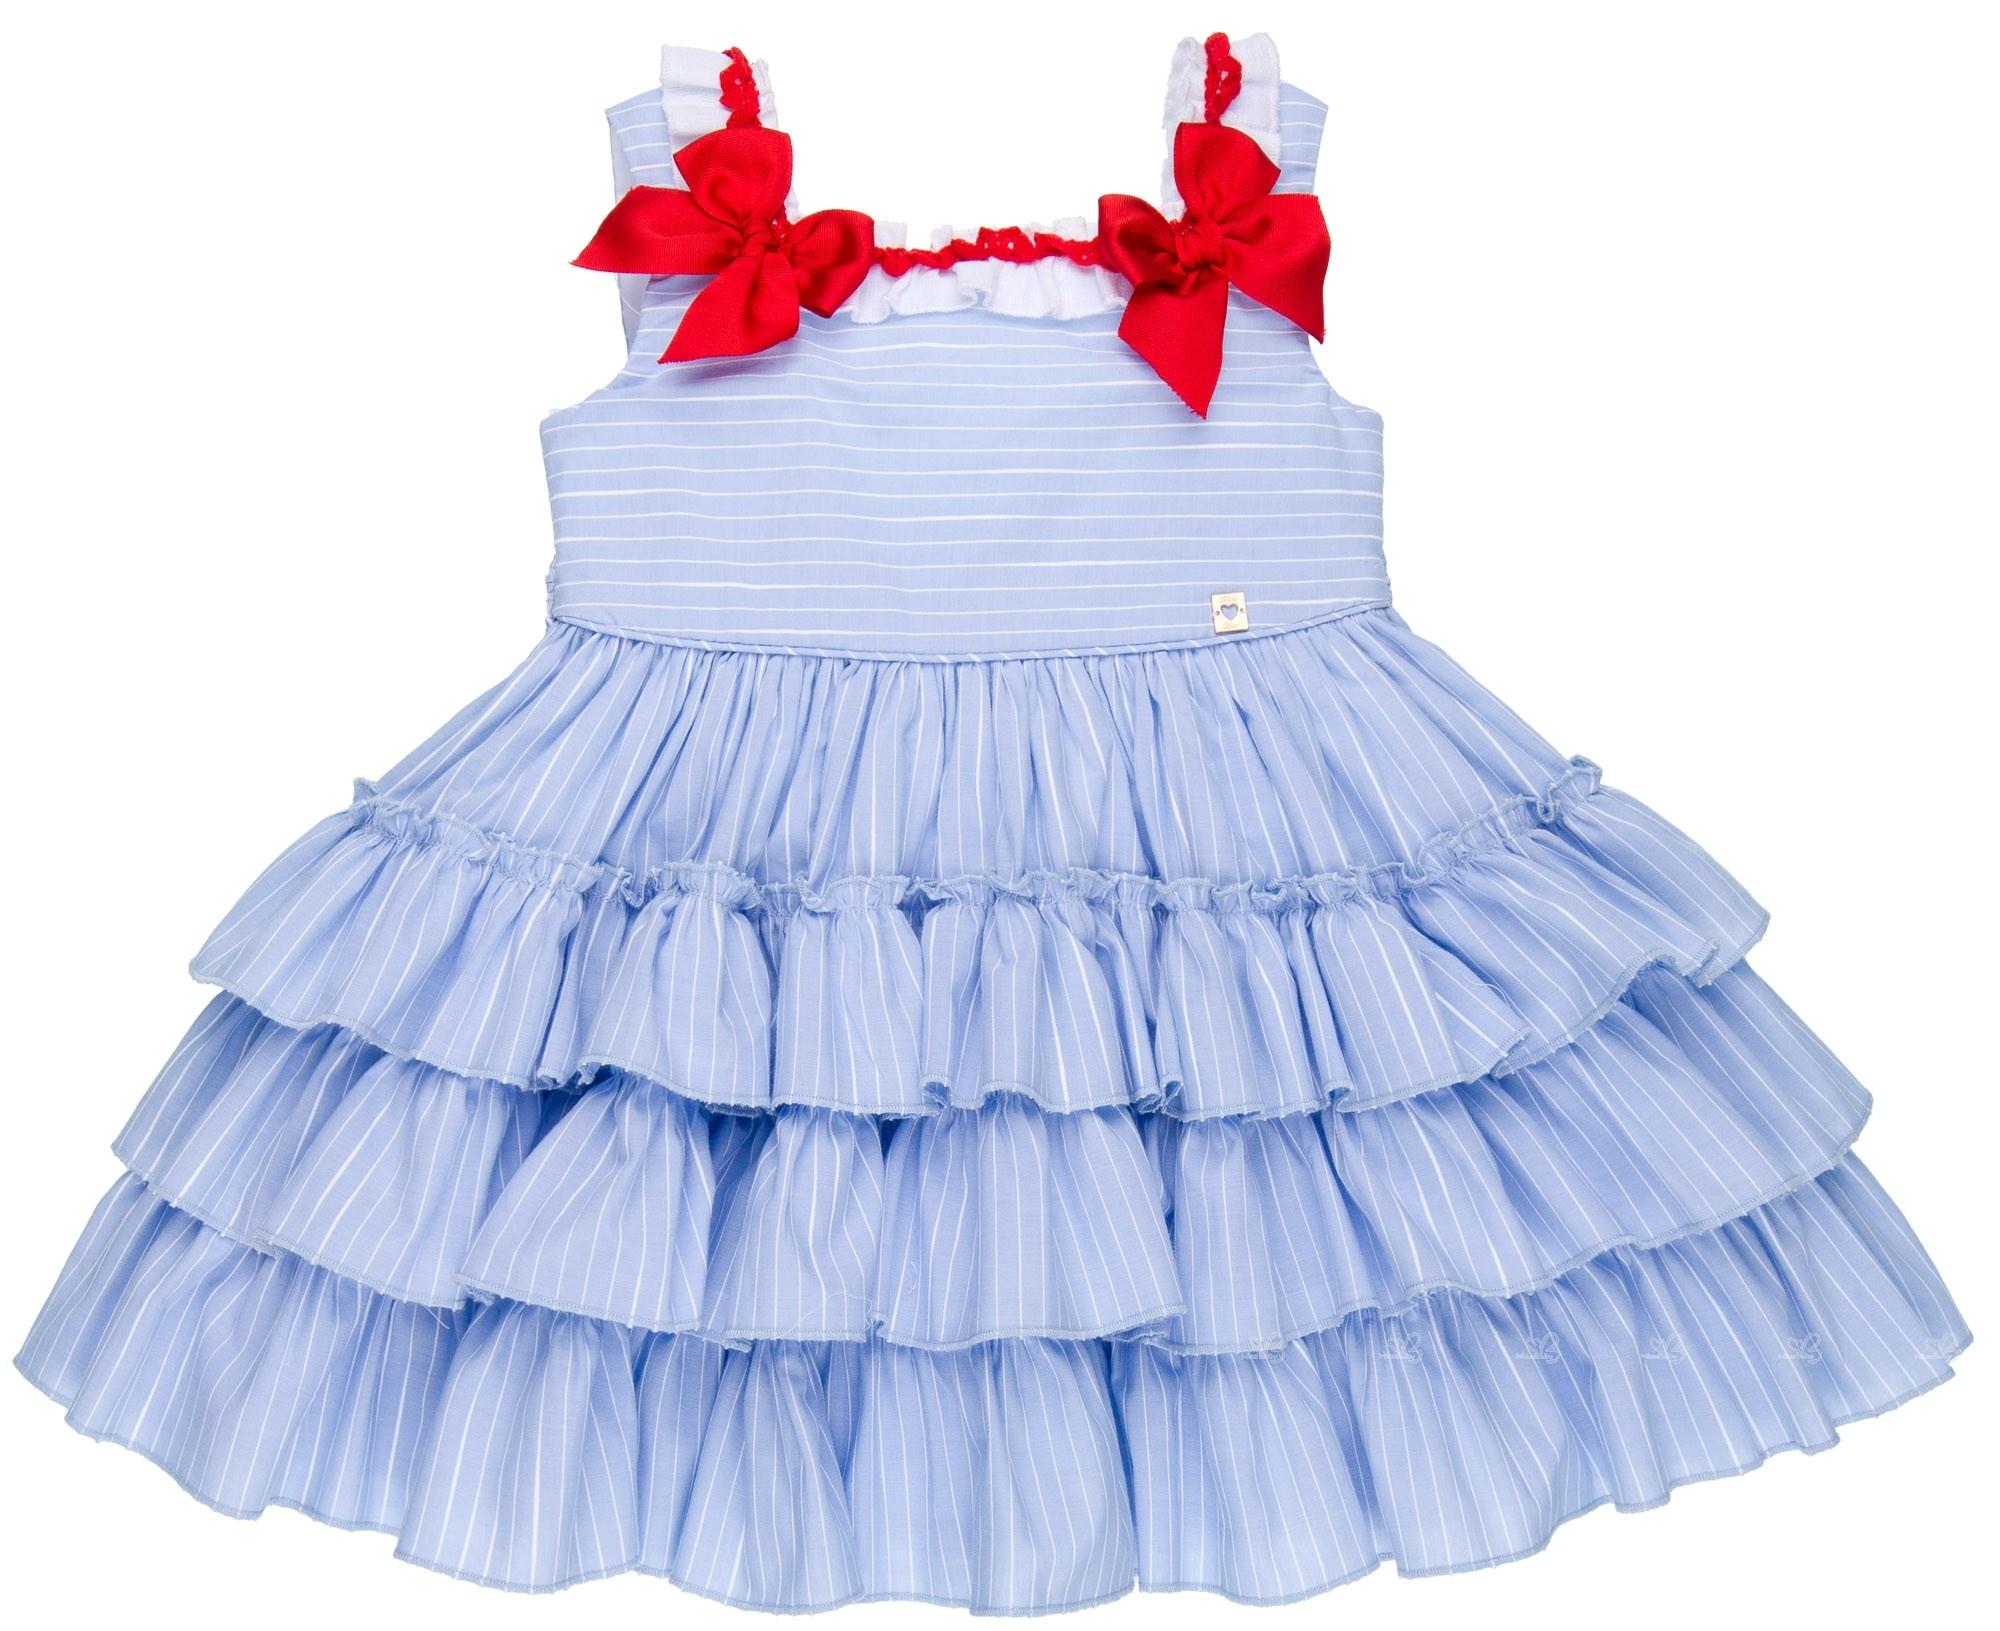 e8017e5cd511 Dolce Petit Girls Light Blue   White Striped Cotton Dress